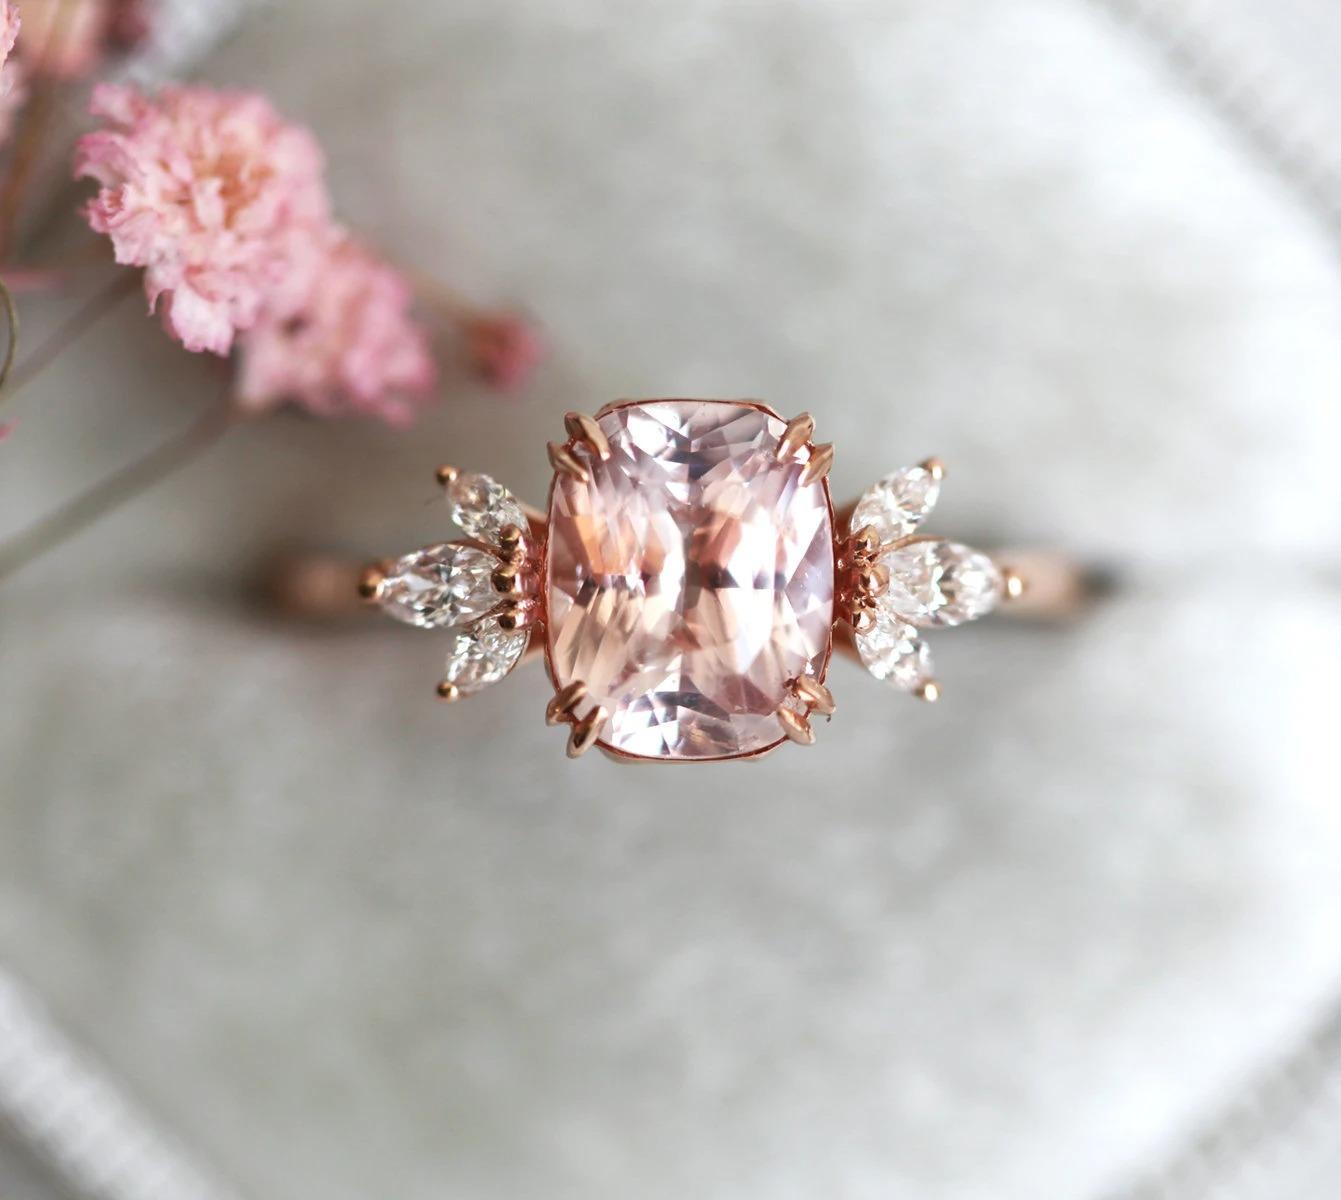 cushion cut peach sapphire ring with marquise diamond accents